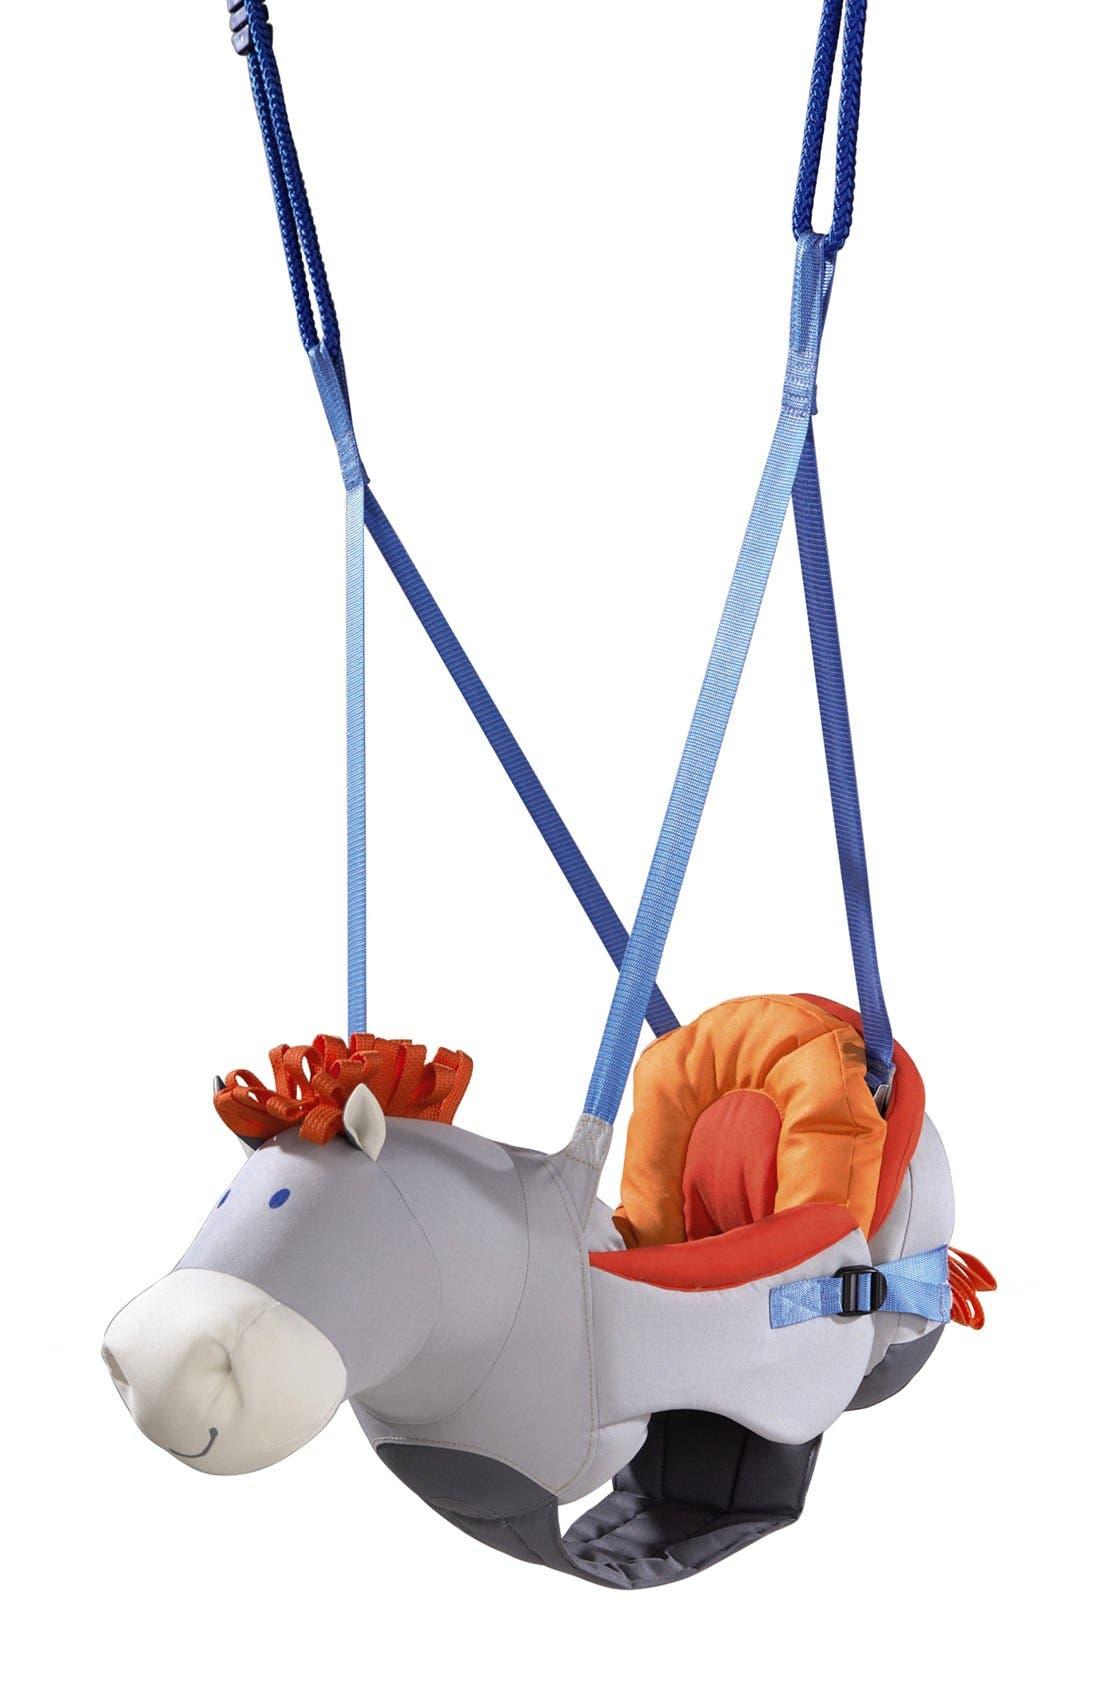 HABA Horse Baby Swing